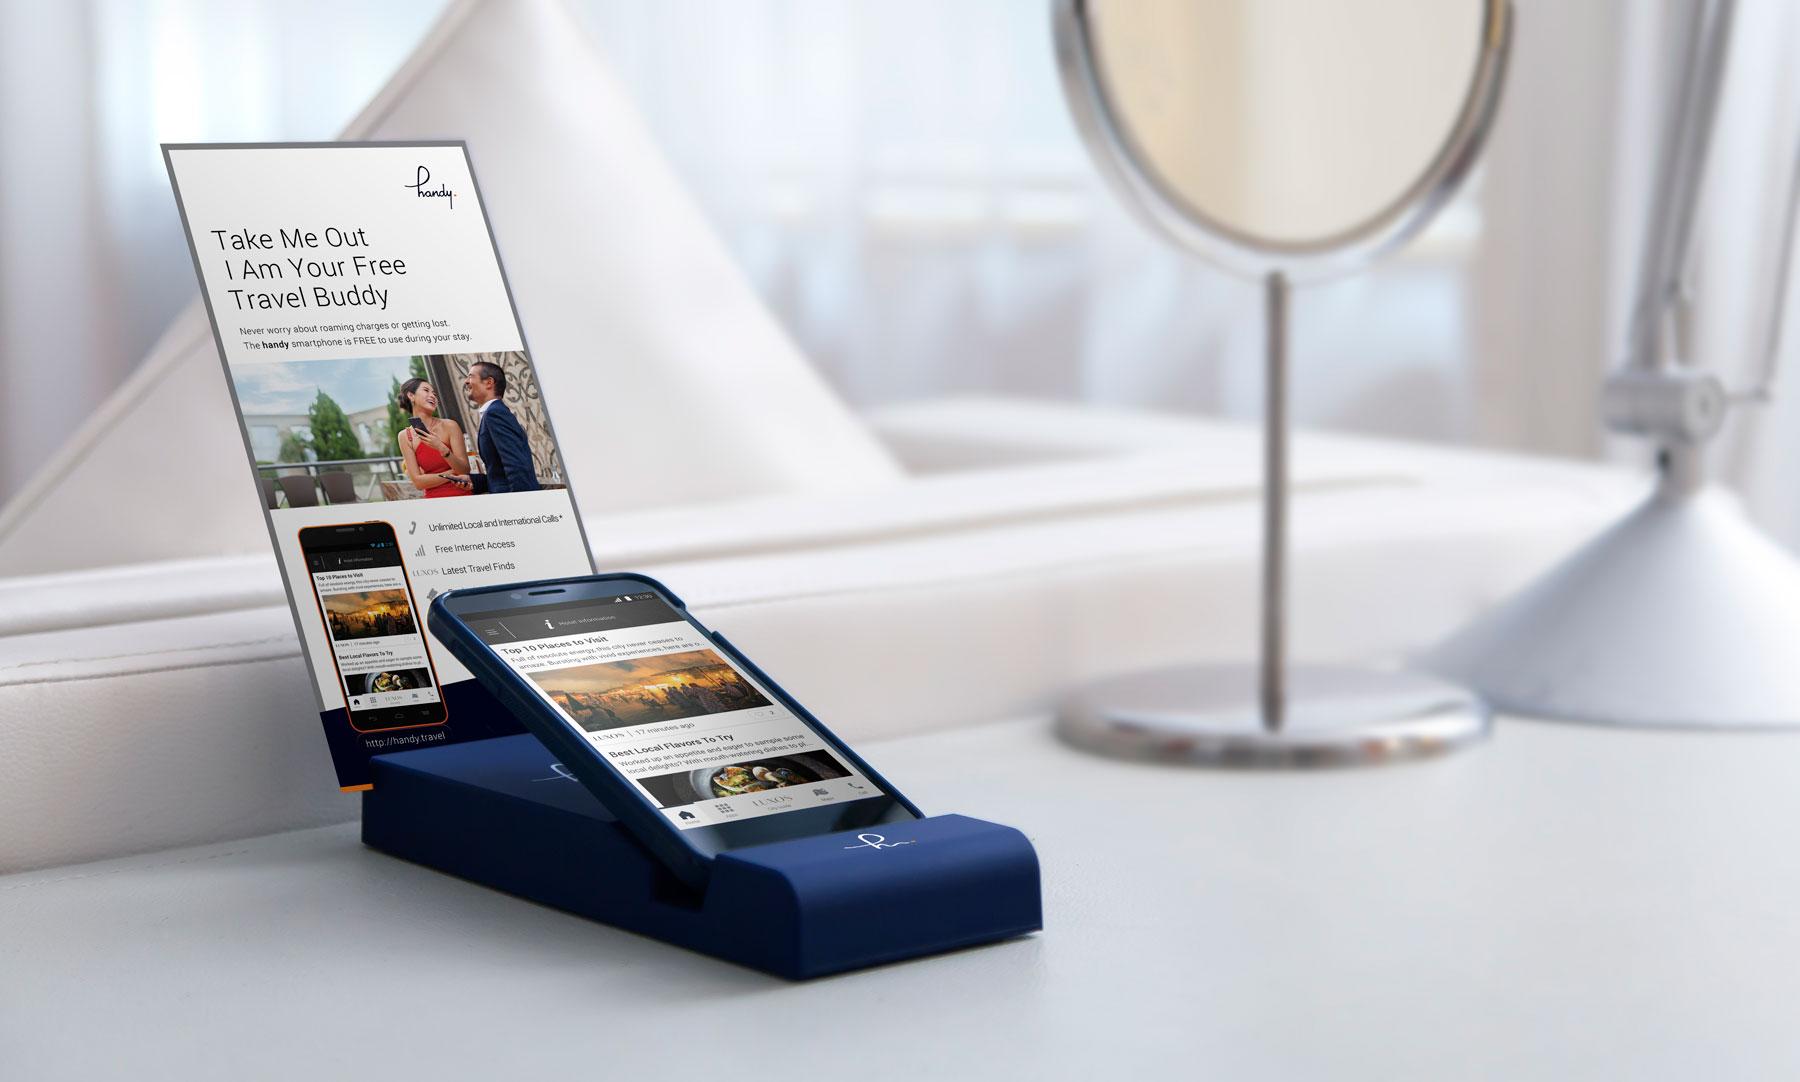 Handy in-room travel buddy smartphone